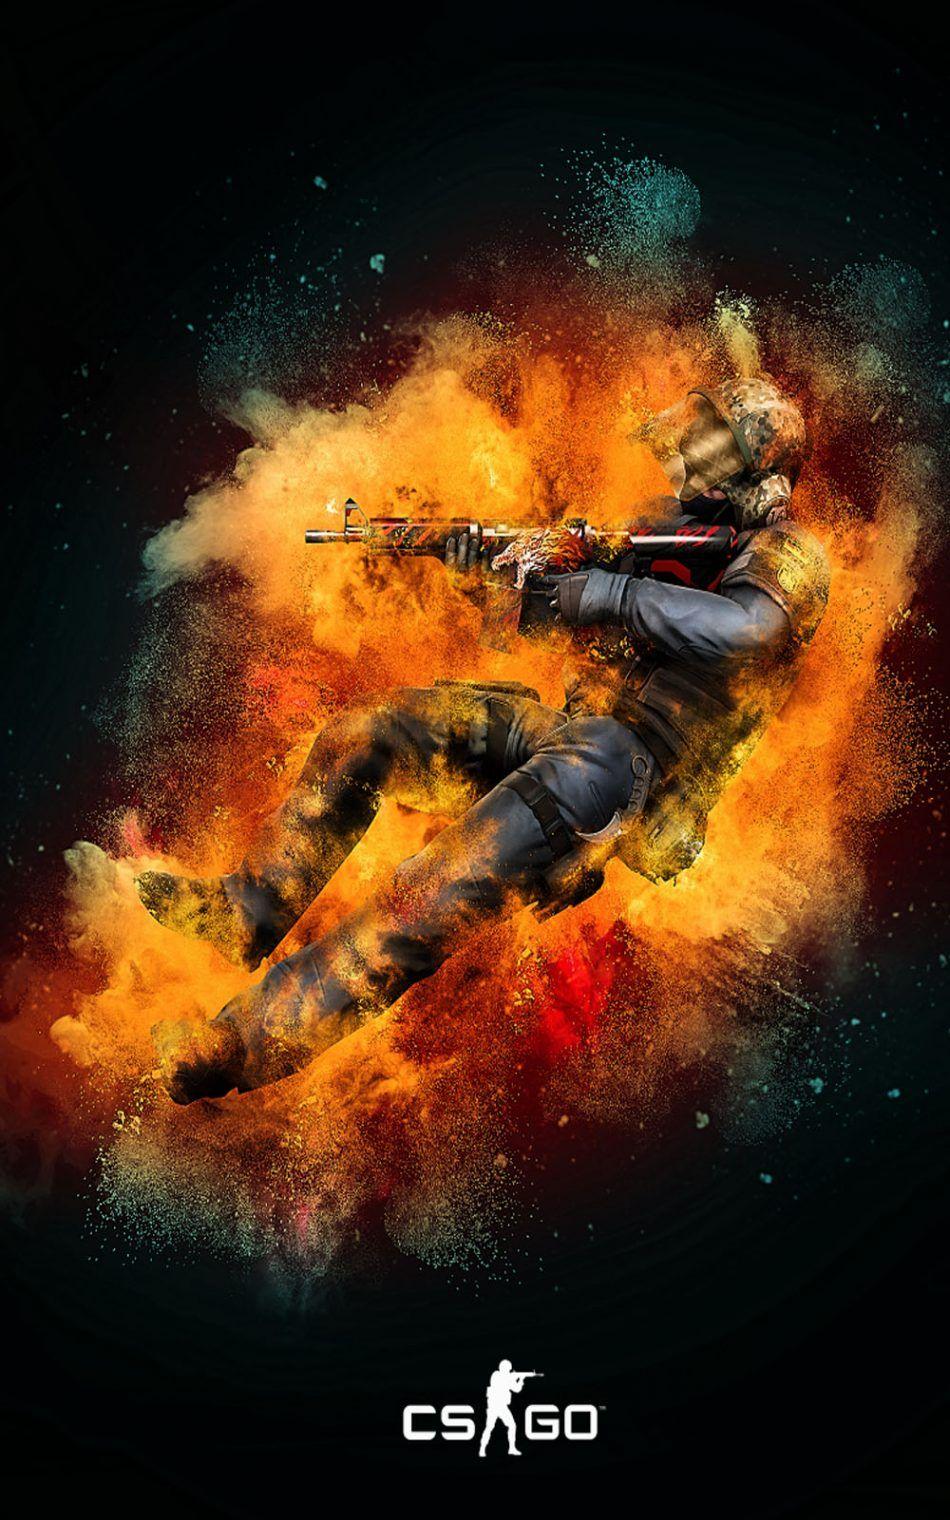 Download Counter Strike Global Offensive Free Pure - Cs Go Wallpaper 4k Phone - HD Wallpaper